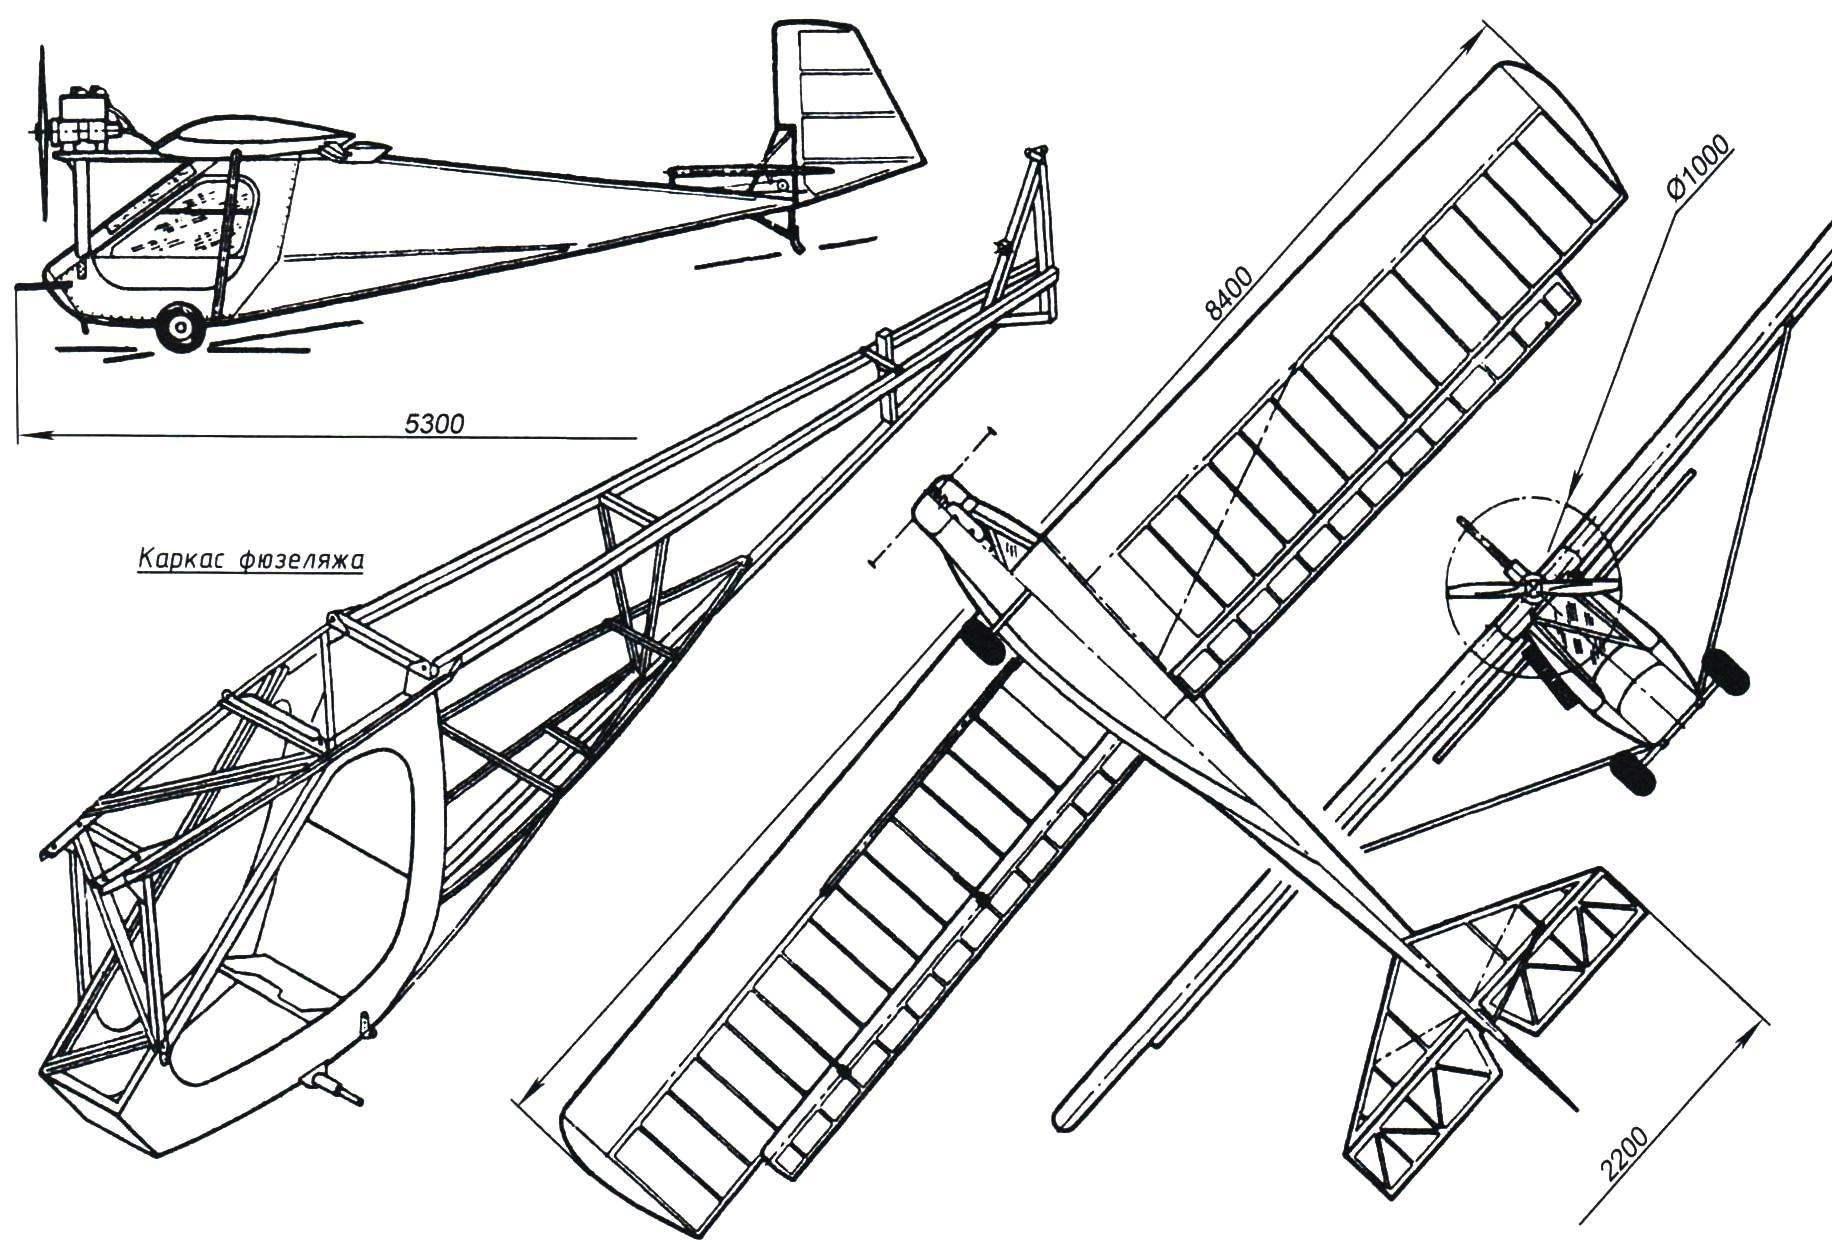 Самолёт ПМК-3